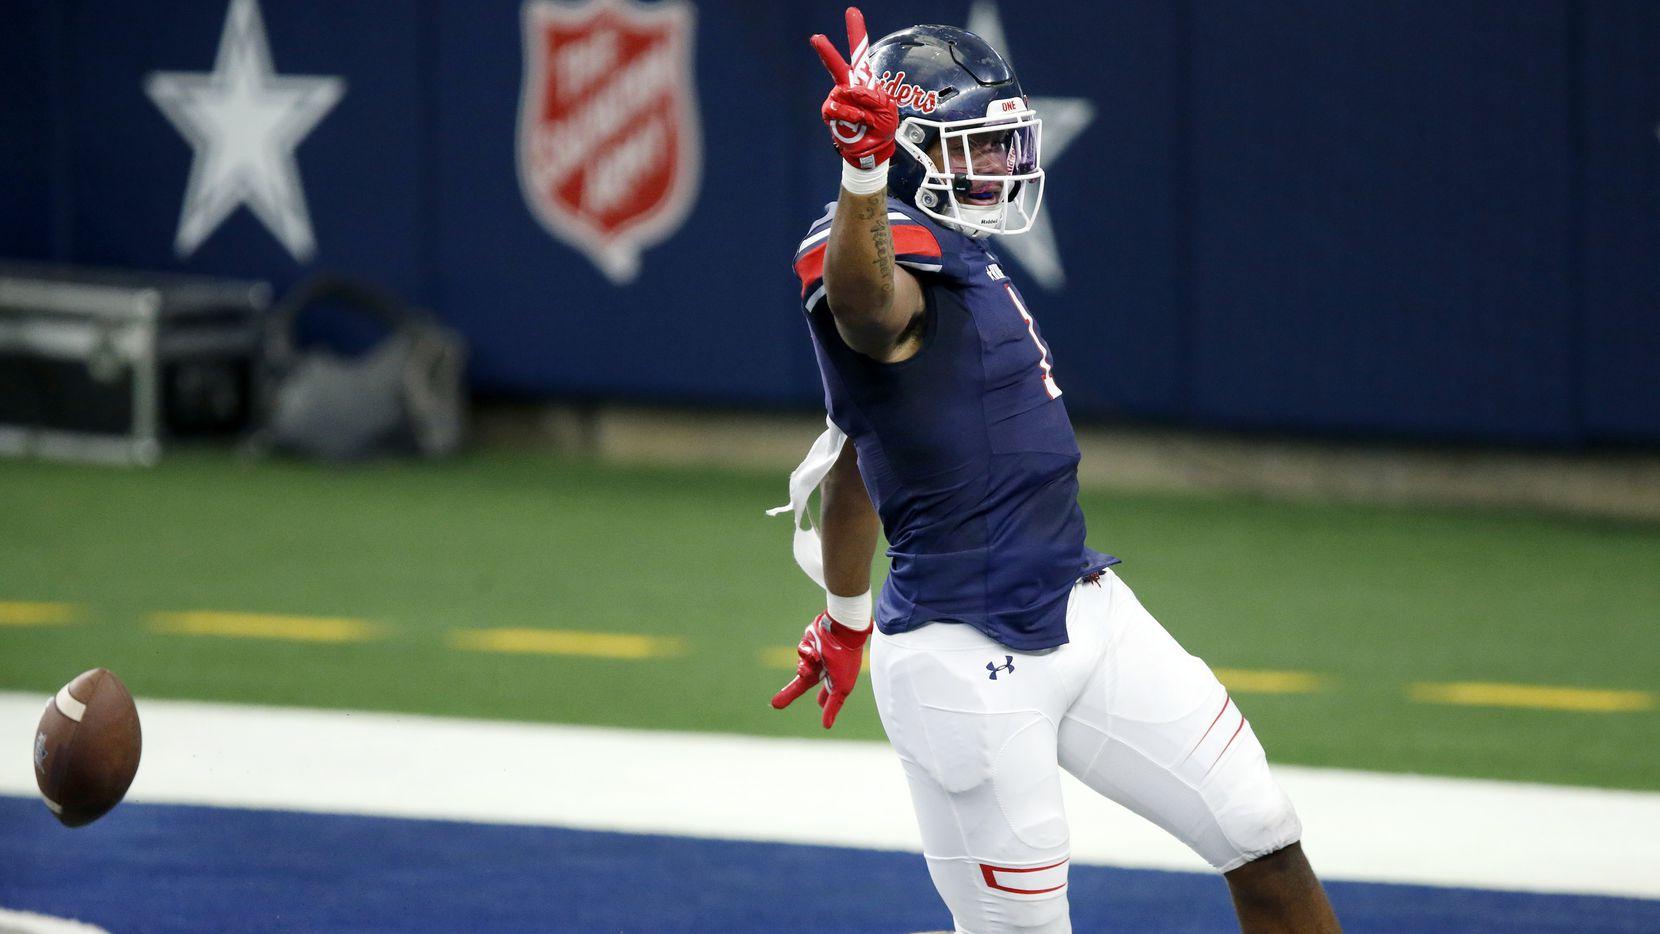 Denton Ryan receiver Ja'Tavion Sanders (1) scores a first quarter touchdown on a long catch and run against Arlington Martin at AT&T Stadium in Arlington, Friday, September 25, 2020.